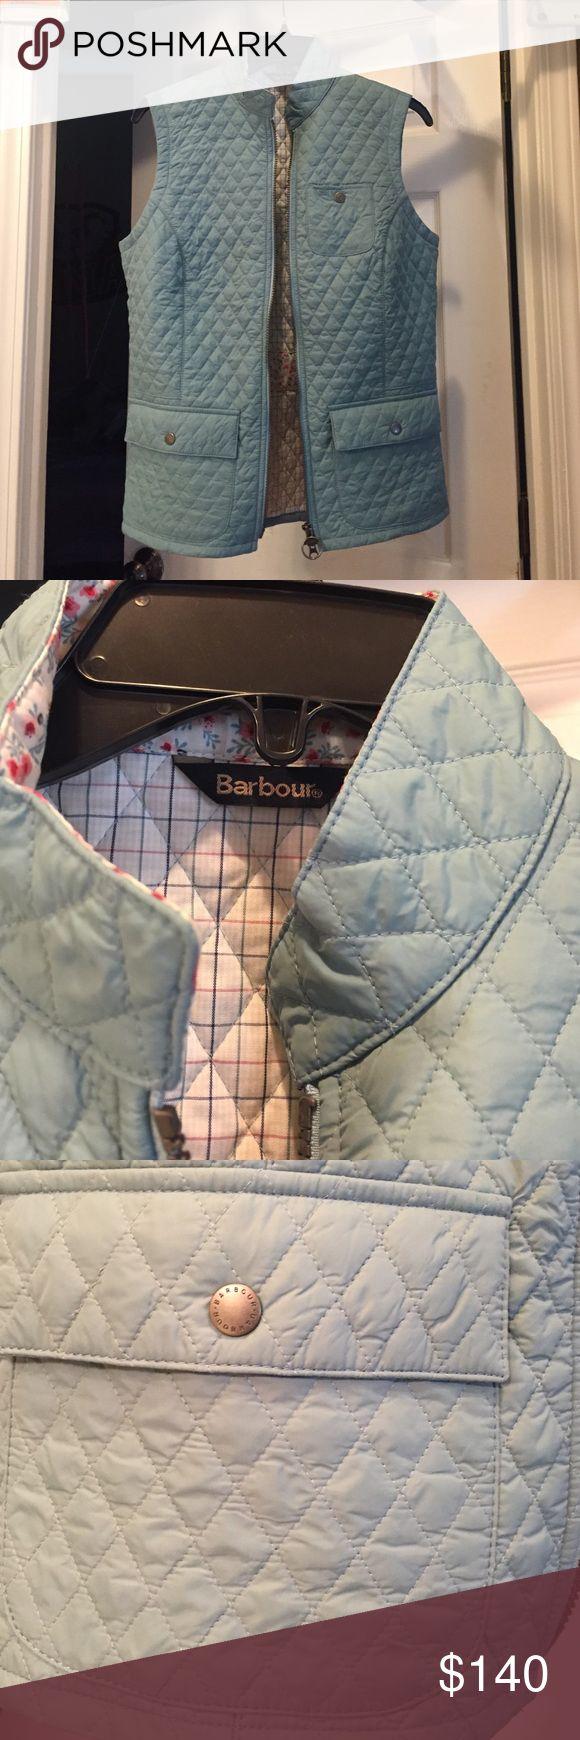 Barbour vest size 8! Gorgeous vest. Does run small, fits more like a 6! Gorgeous blue color! never worn, no problems! Barbour Jackets & Coats Vests